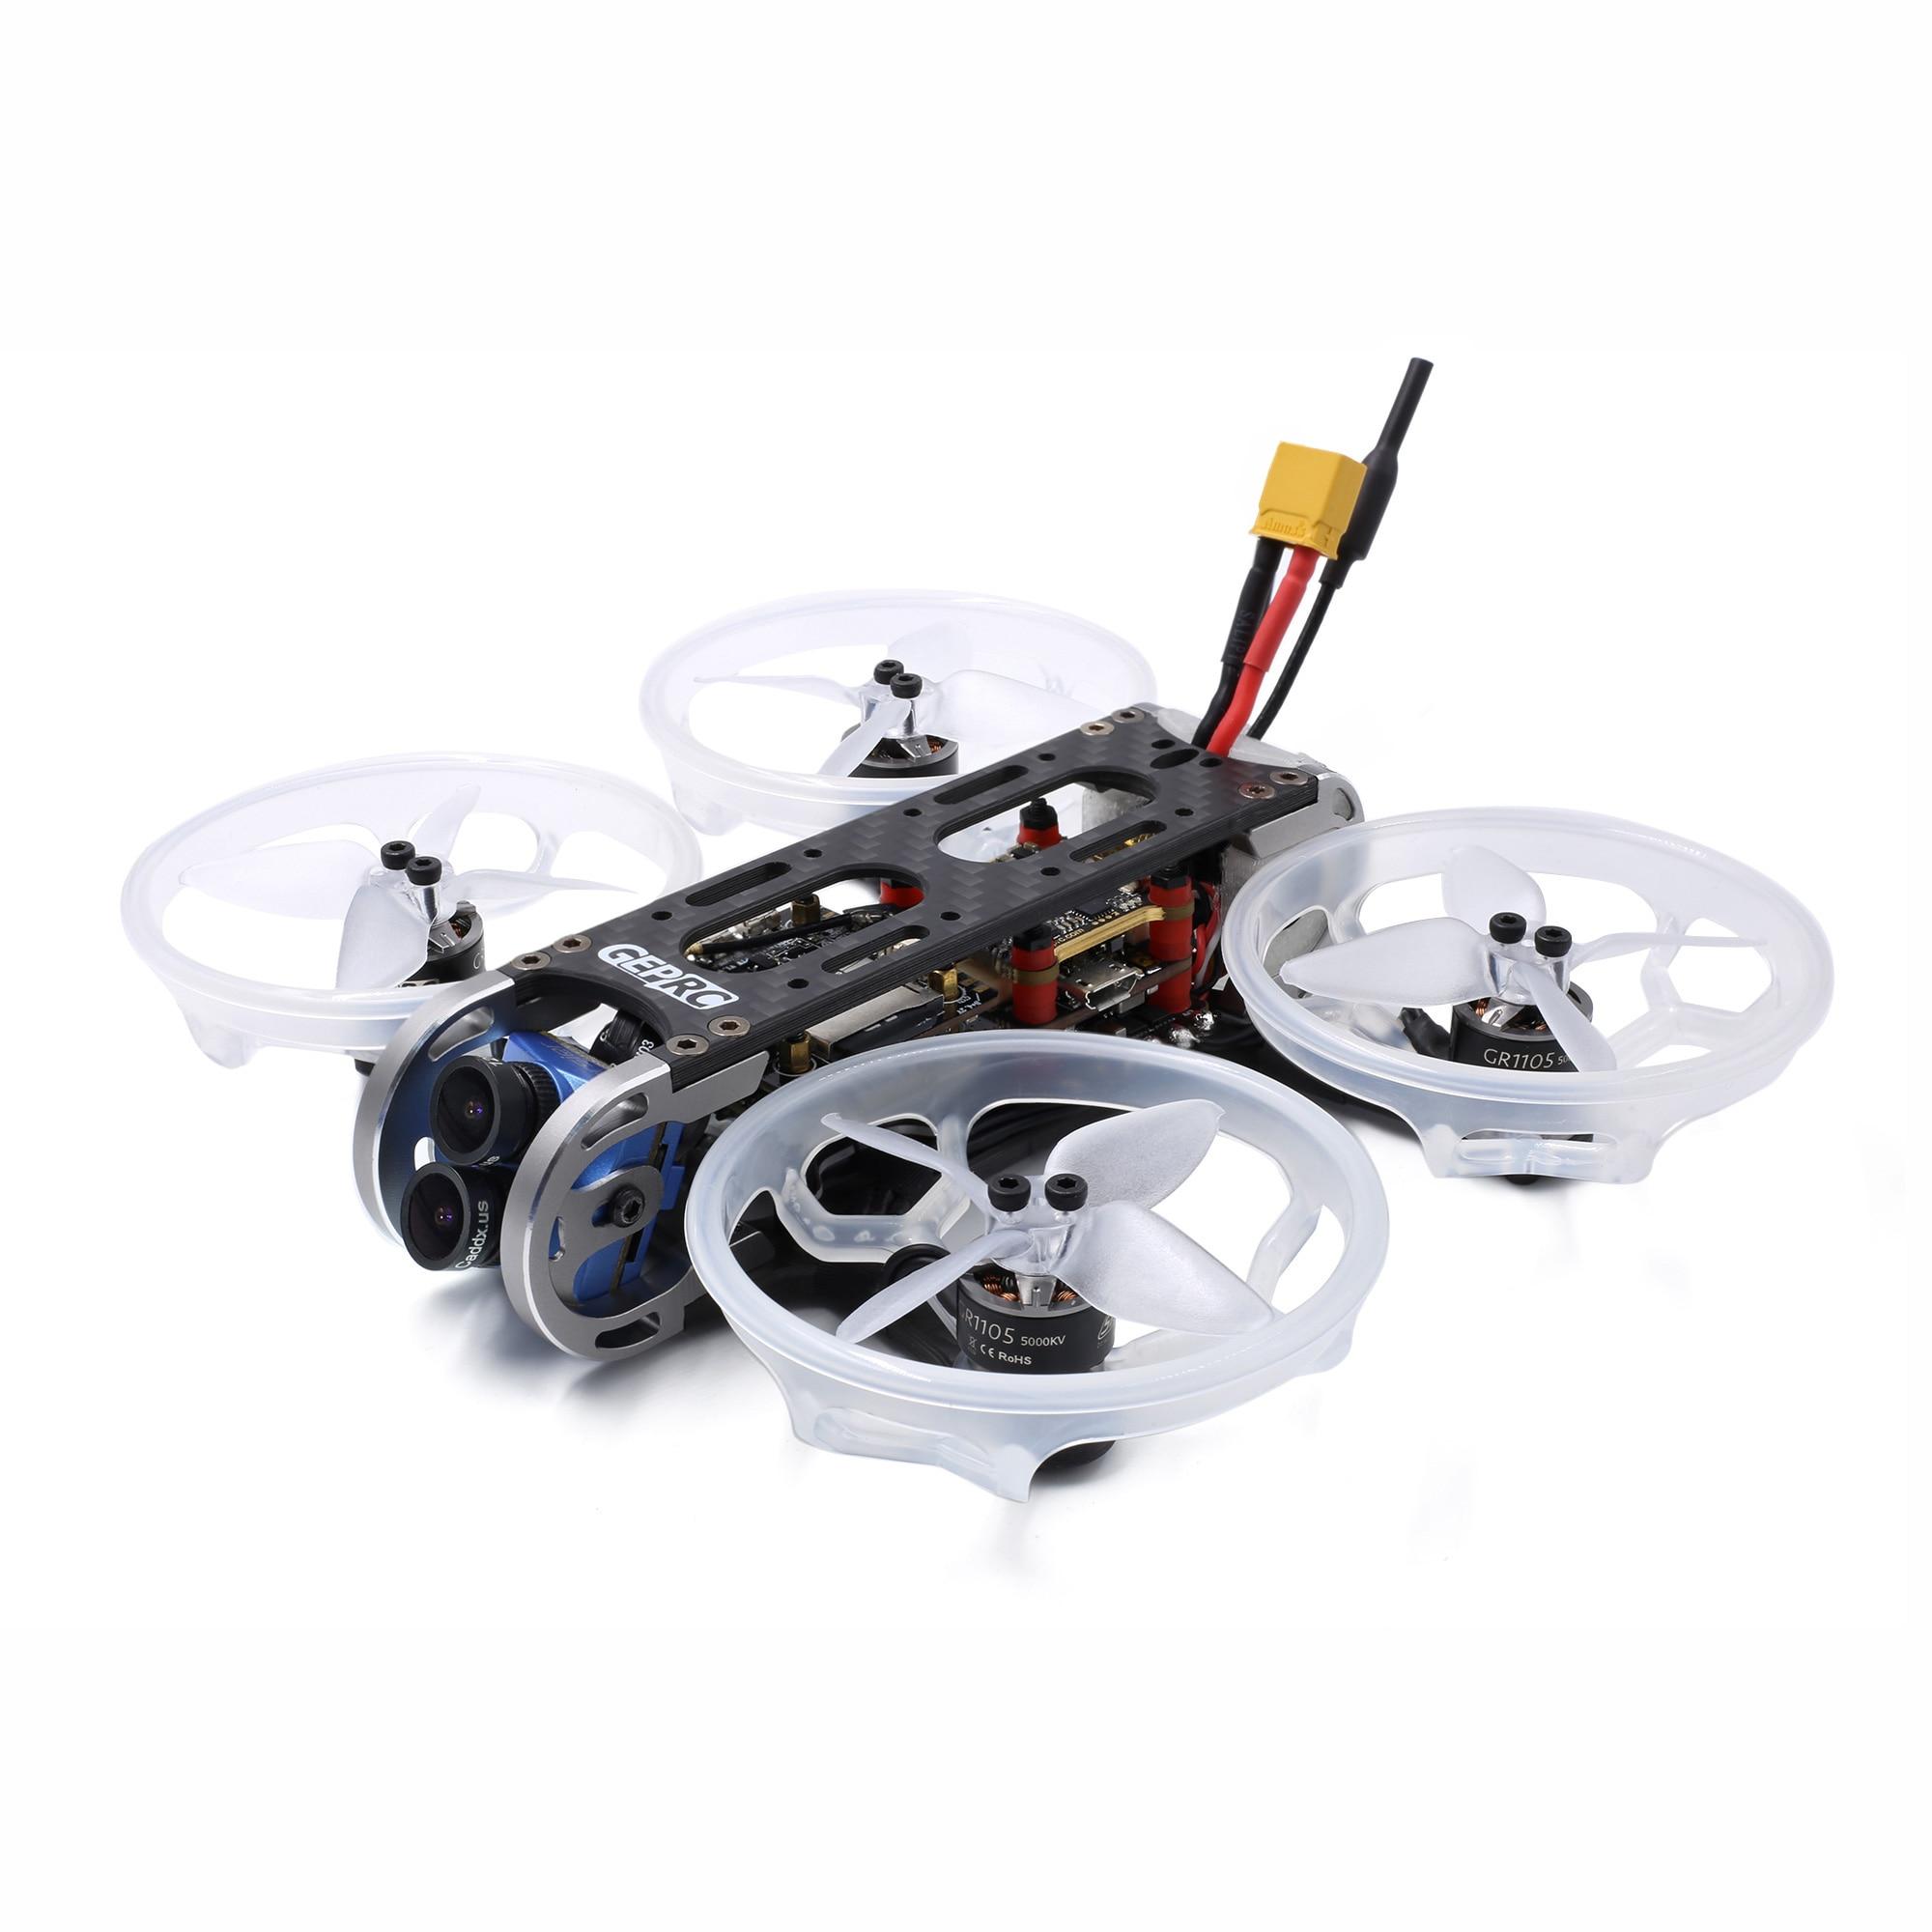 GEPRC CinePro 1080P 4K HD FPV Racing Drone 4S Compatiable mit F7/F4 Flight Controller DALPROP q2035C Requisiten 1105 5000kv motor - 3